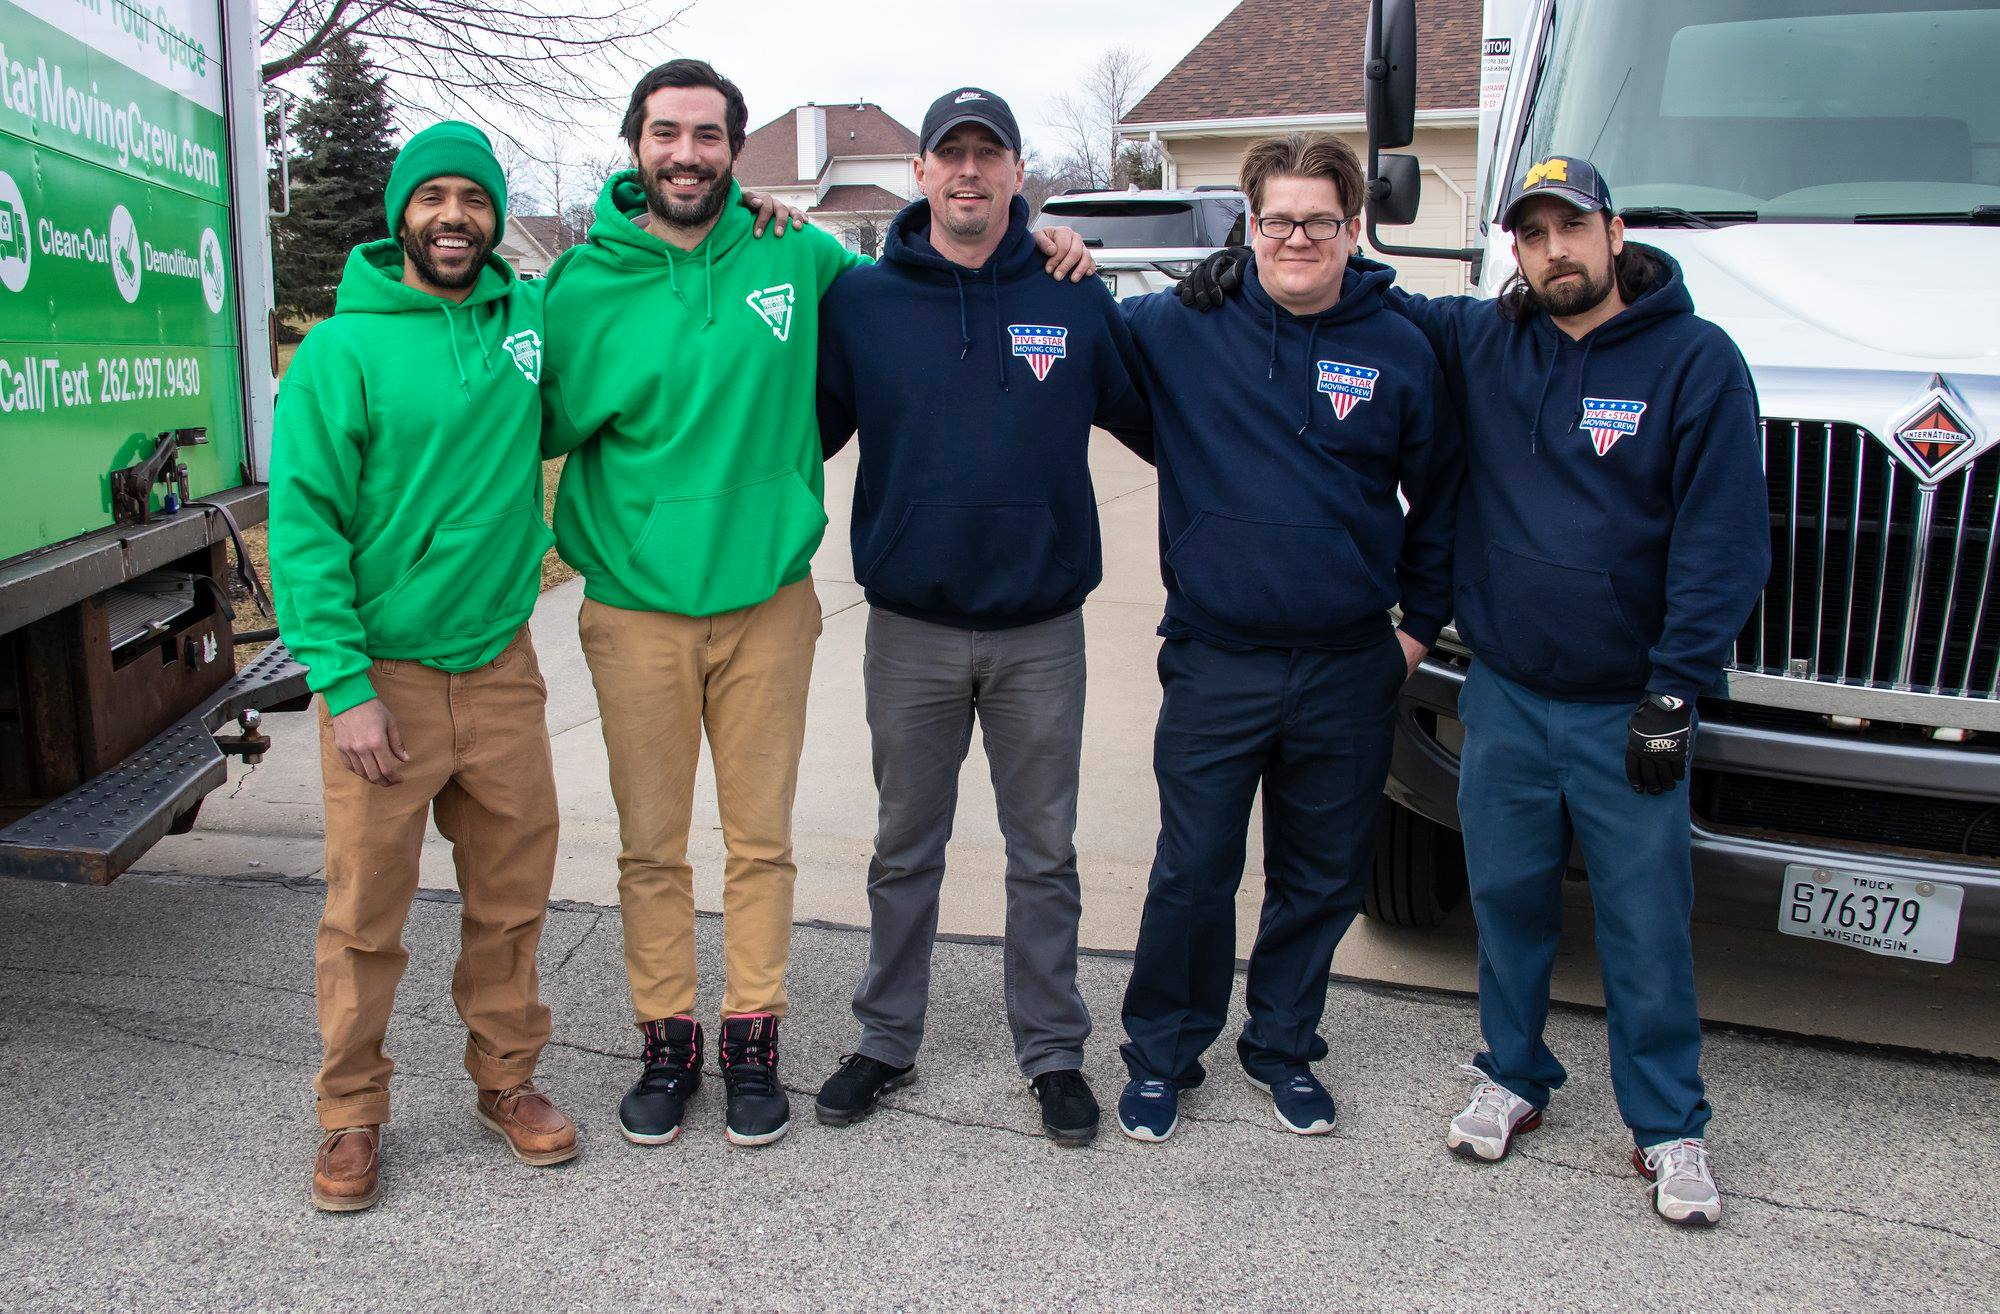 the green team, kenosha junk removal, junk pickup in kenosha